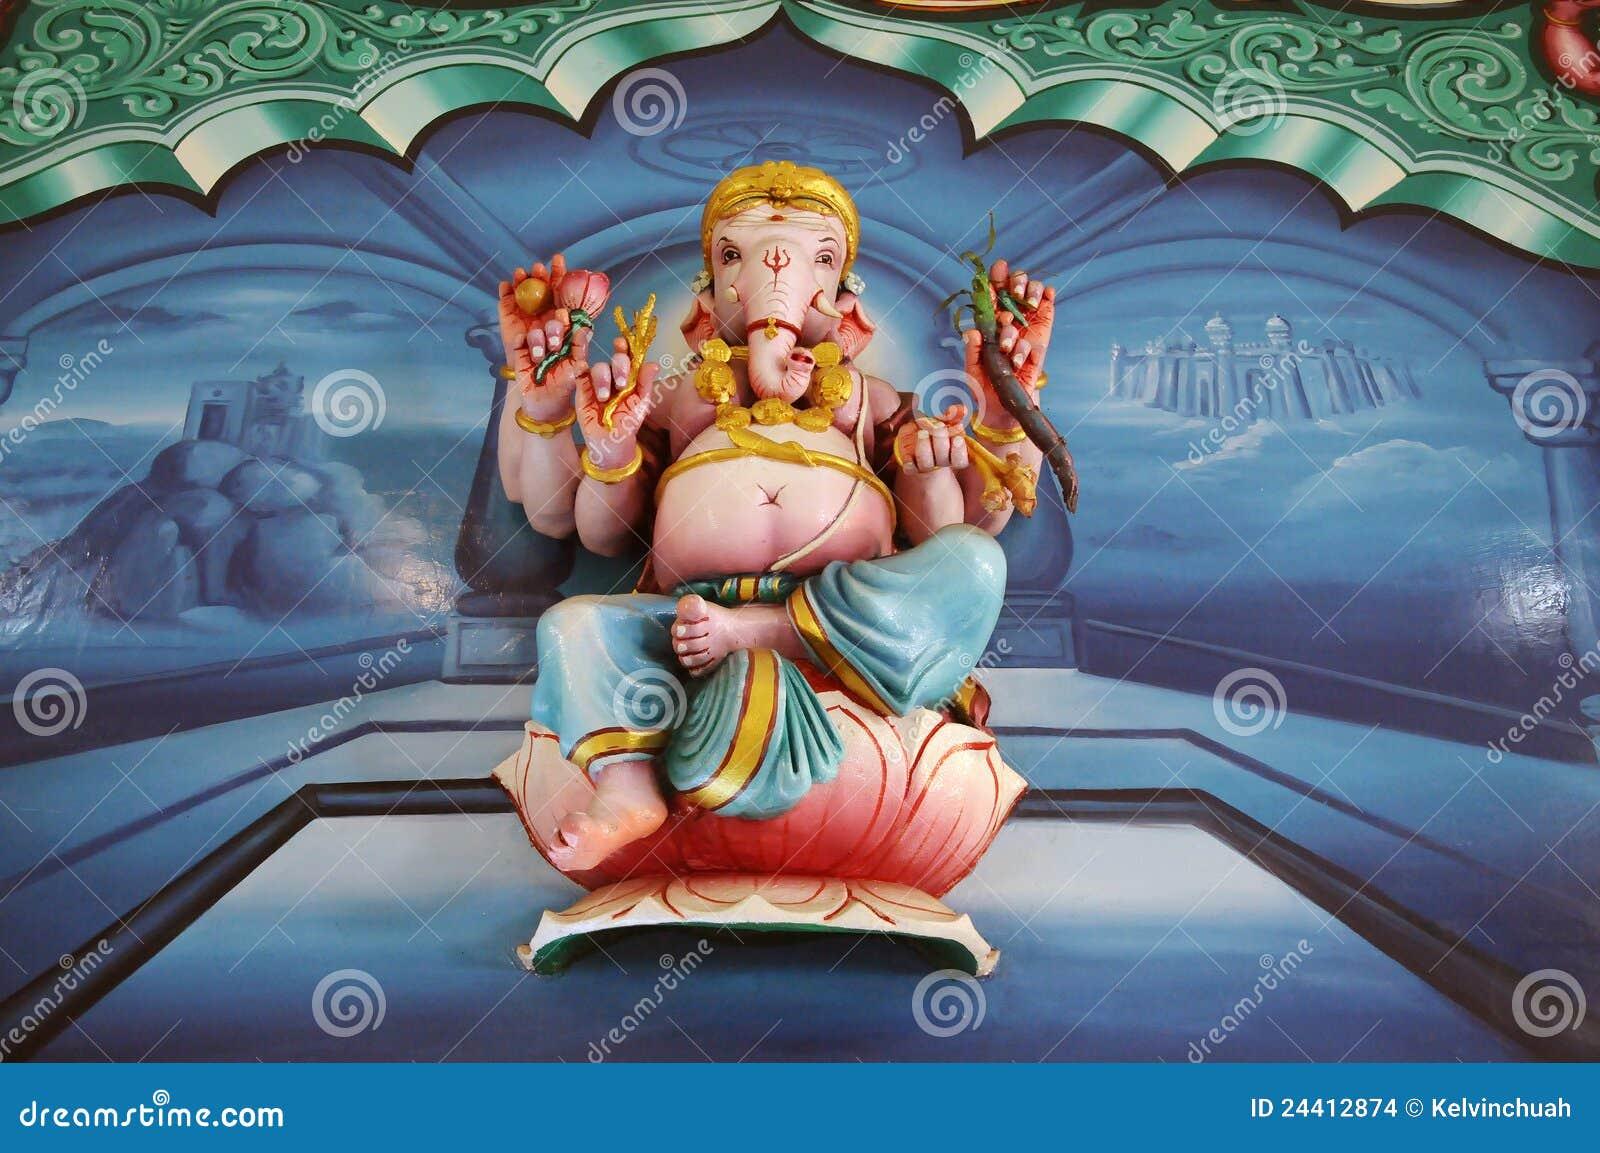 Ganesha sitting on lotus flower india stock images image 24412874 royalty free stock photo dhlflorist Gallery